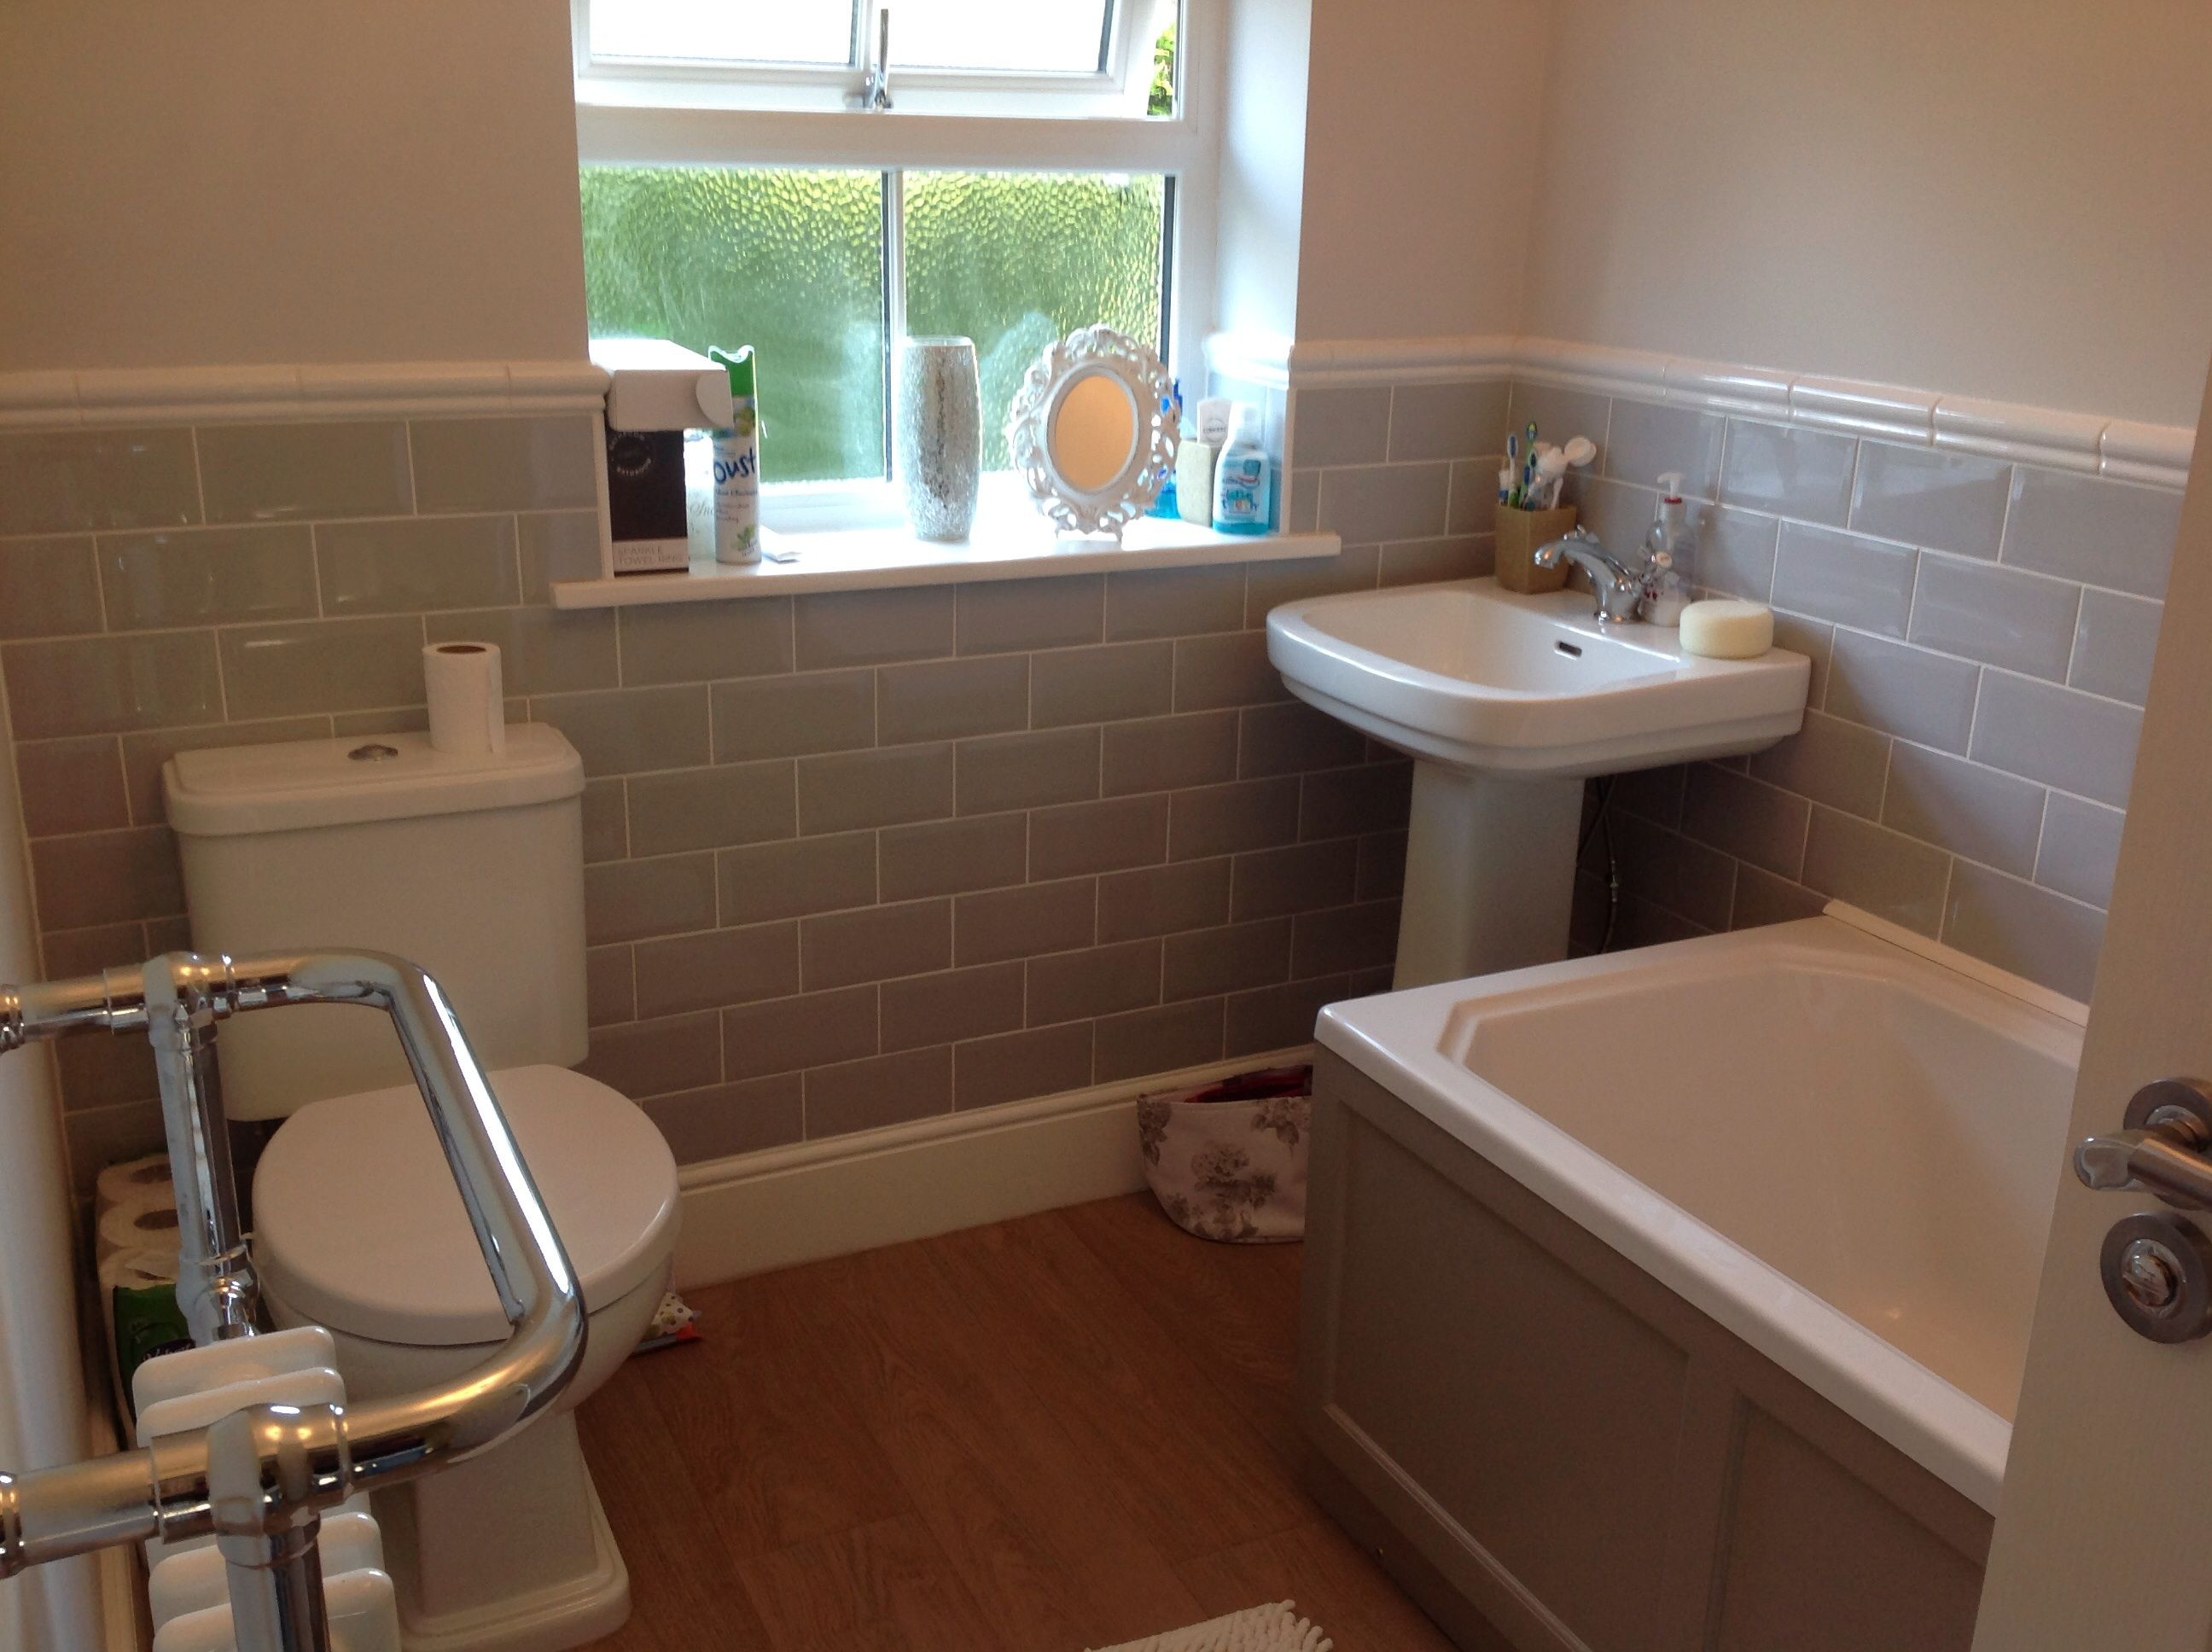 grey metro tiles rac decor bathroom roper rhodes hampton bath panel traditional towel